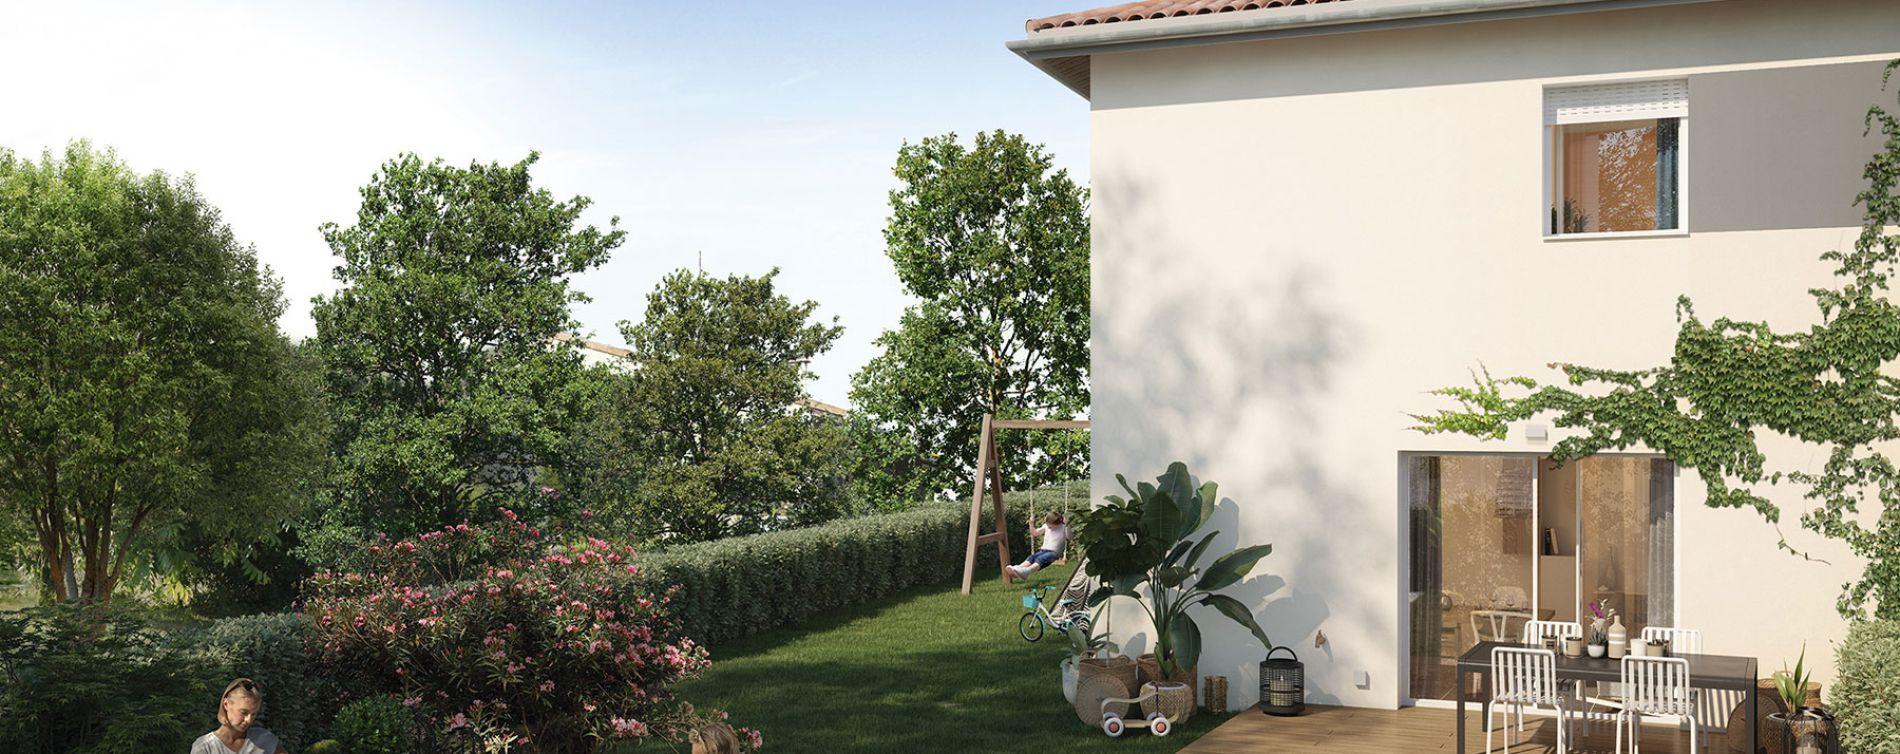 Sainte-Eulalie : programme immobilier neuve « Vista Vinia » (2)